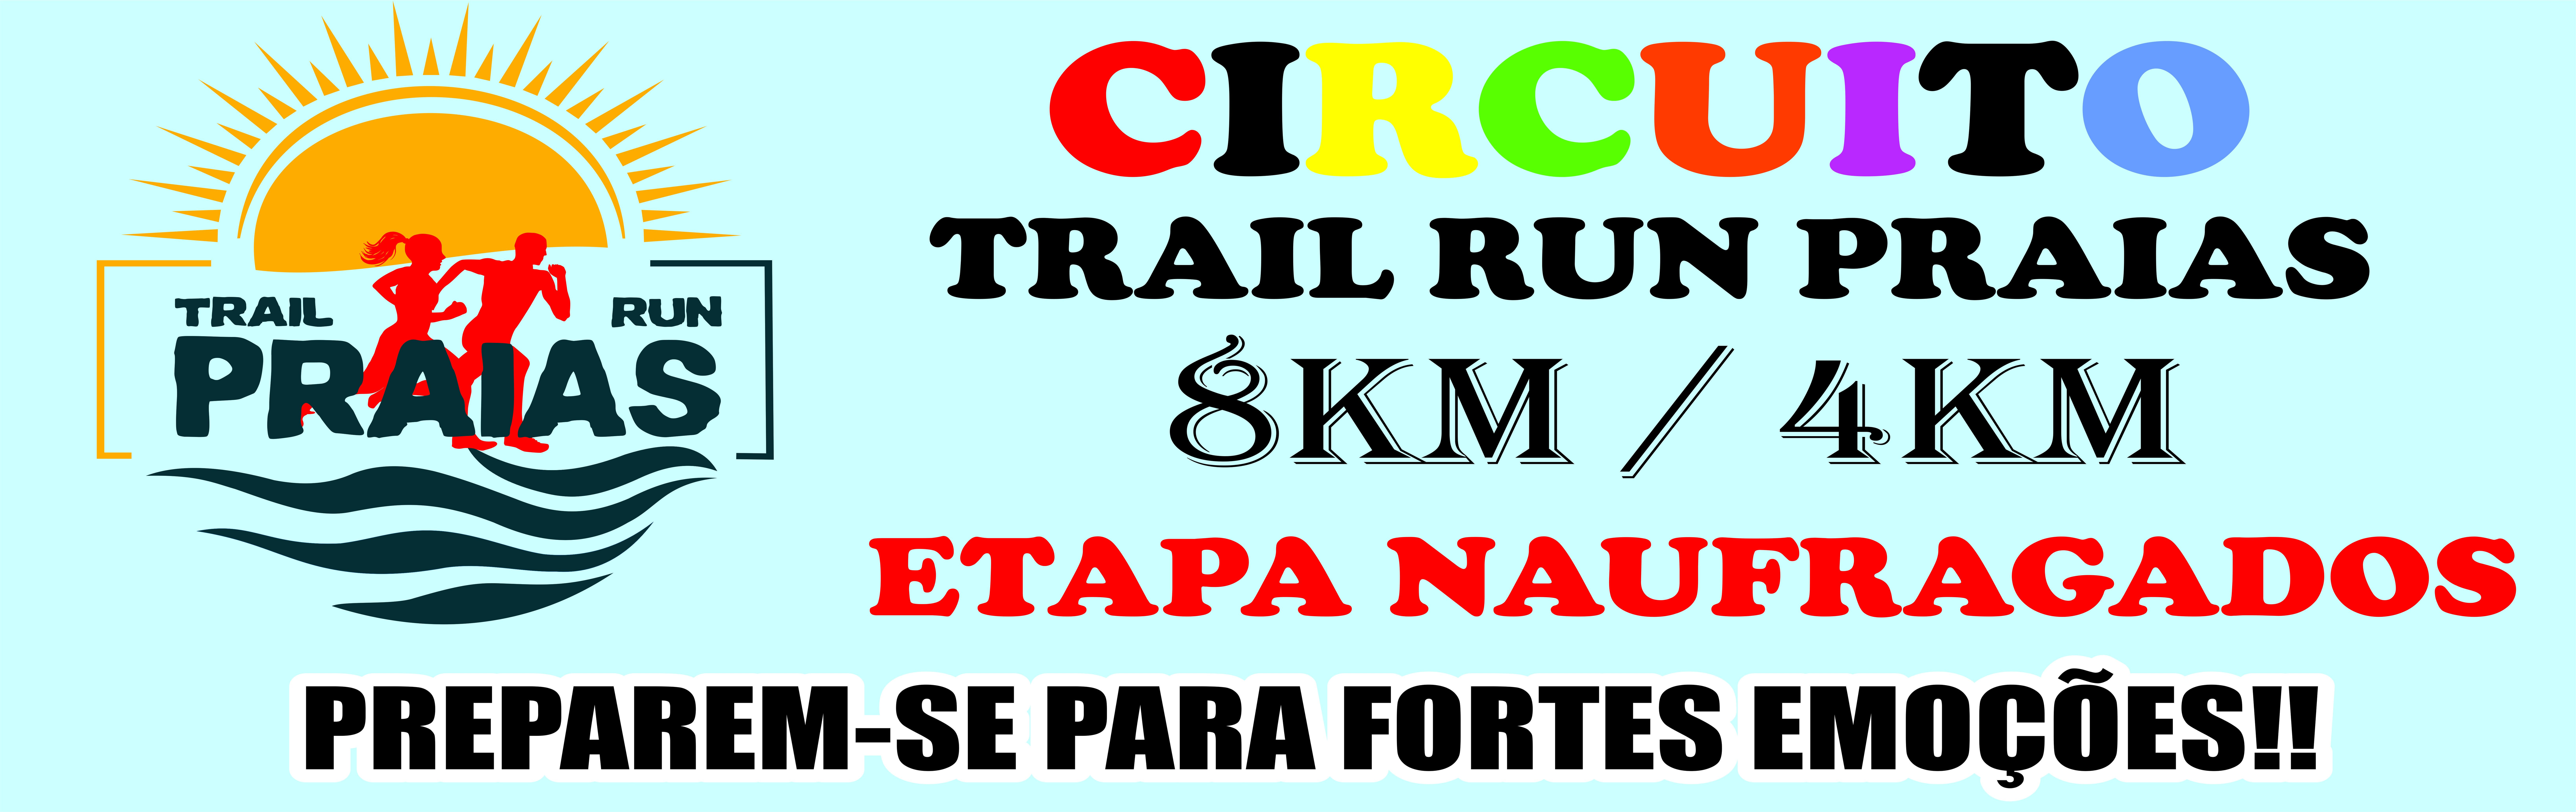 Trail Run Praias - Etapa Naufragados